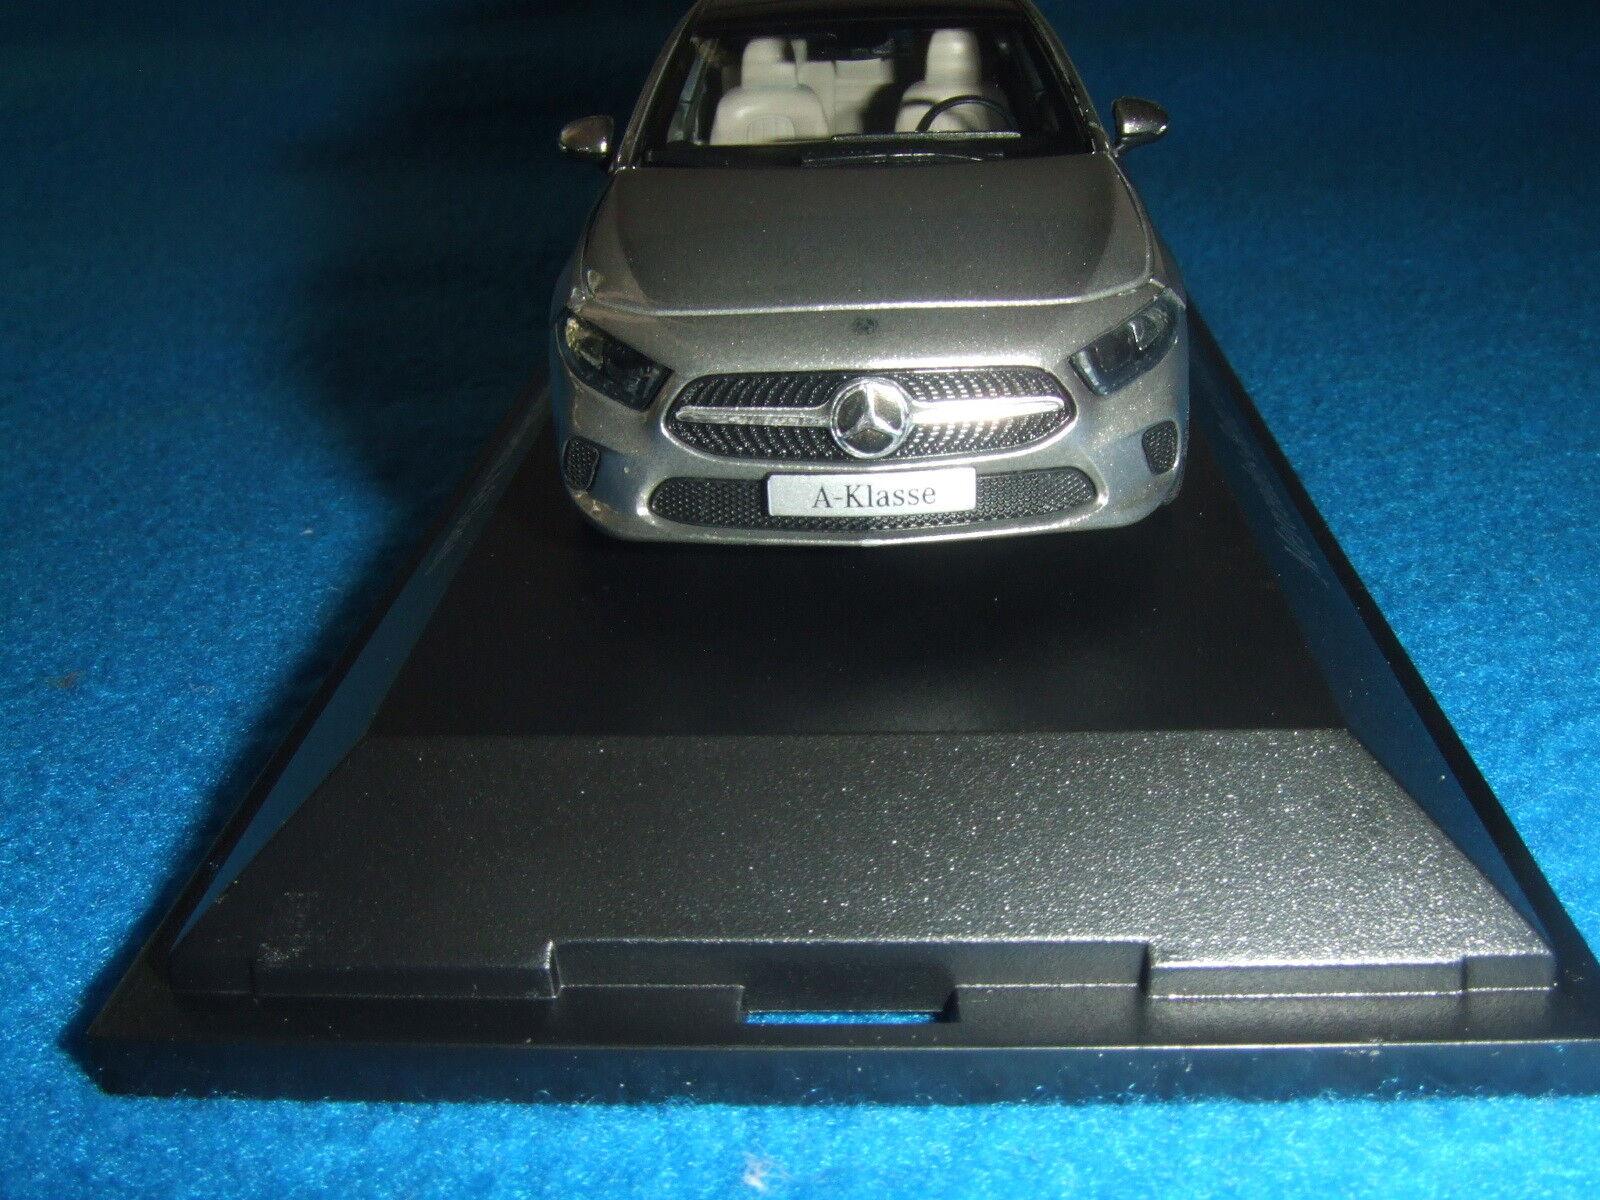 Mercedes Benz W 177 177 177 - A Klasse 2018 Mojawe silver 1 43 Neu OVP 080229